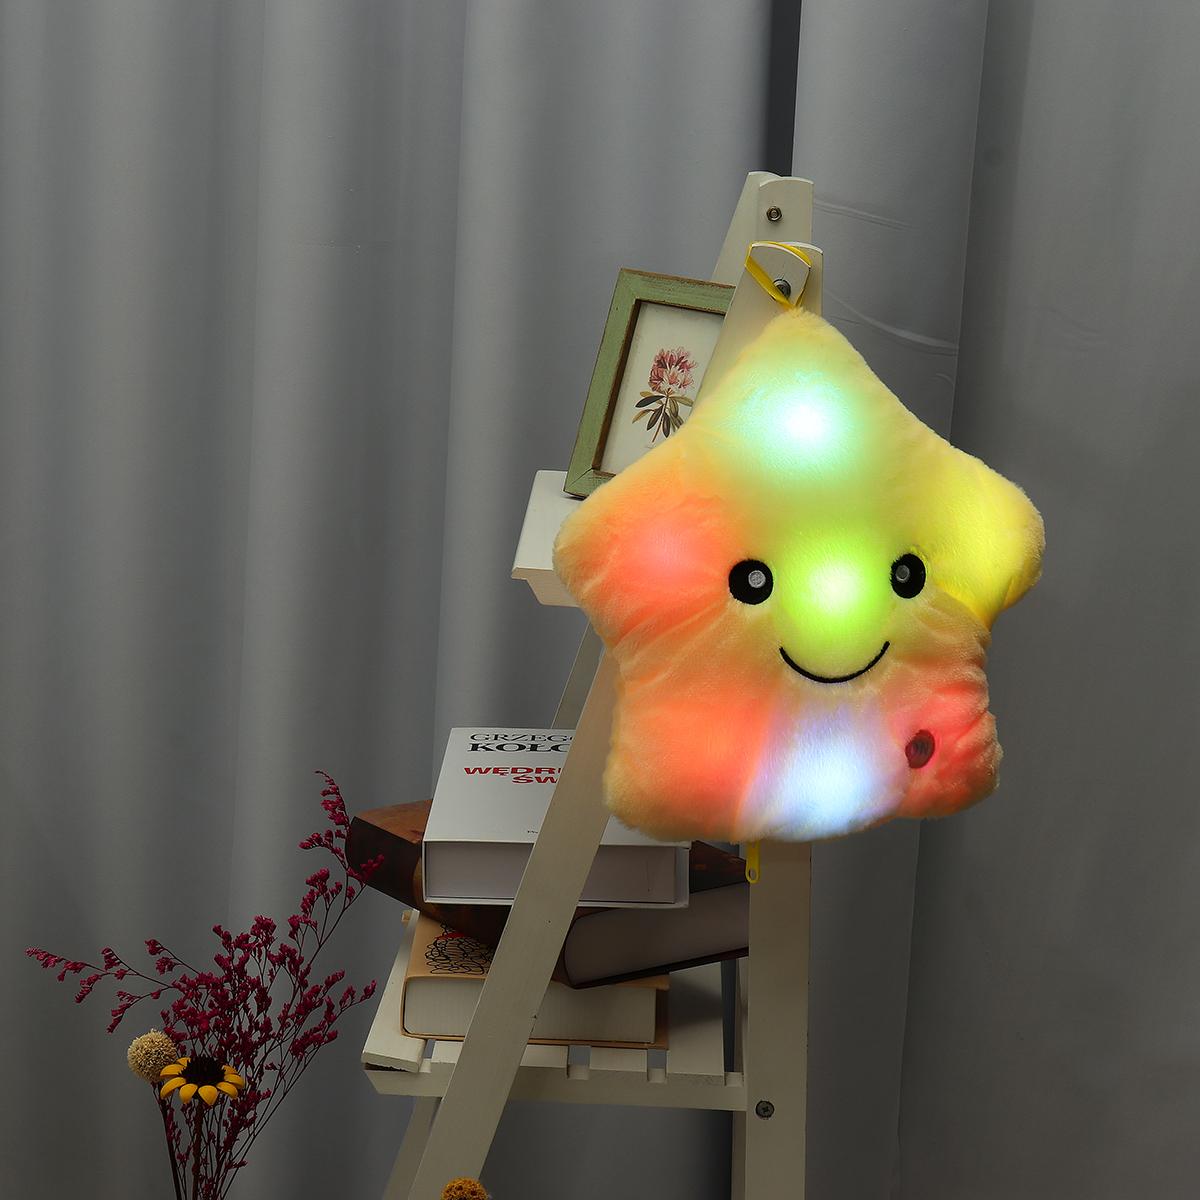 LED Light Star Stuffed Plush Cushion Sofa Pillow Glow Kid Toy Gift Home Decor UK